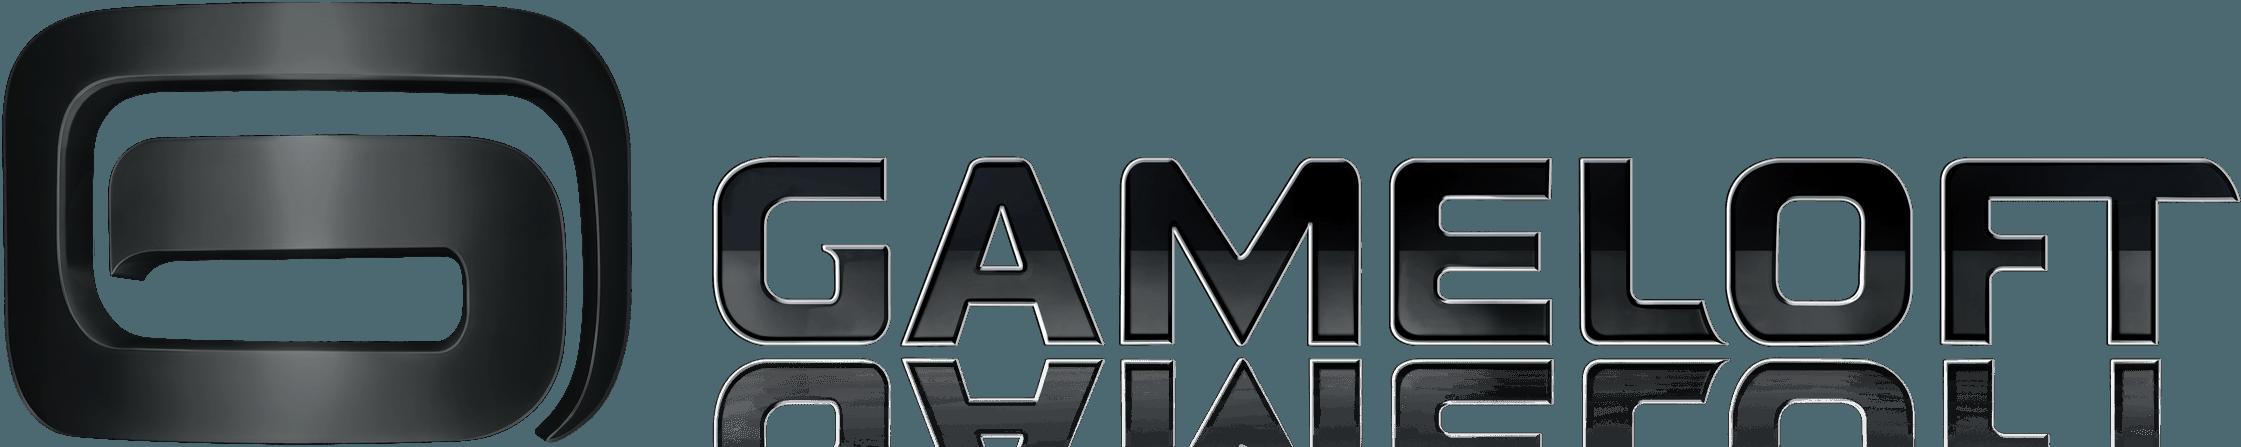 Gameloft Logo.